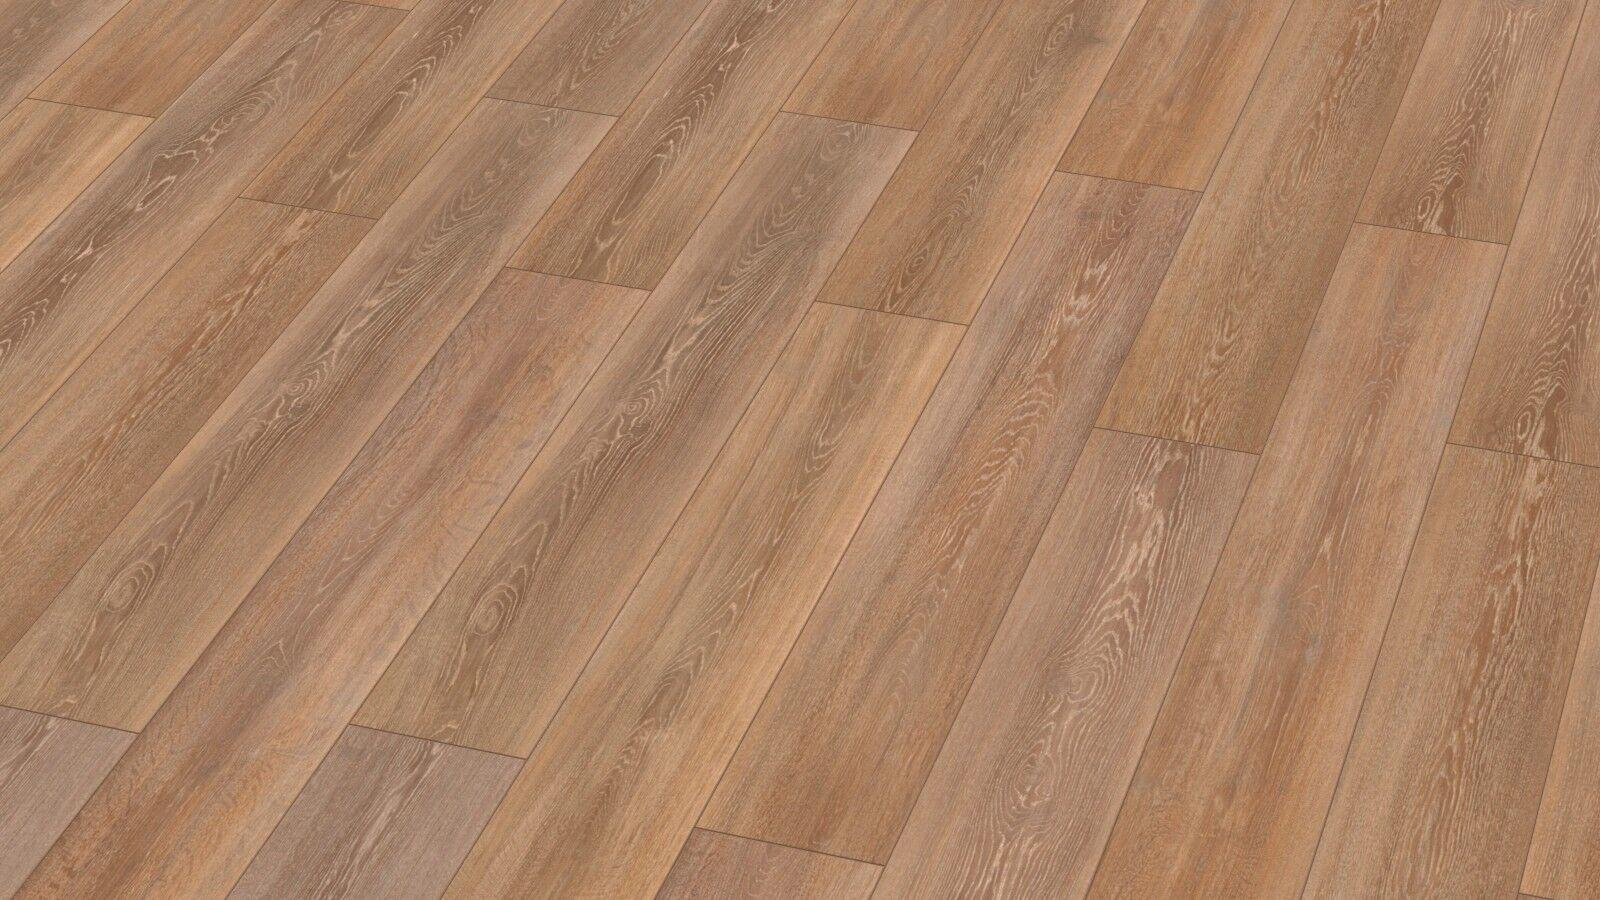 Laminat Kronotex Exquisit Stirling Oak D2805 Leiste & Dämmug ab  /m²